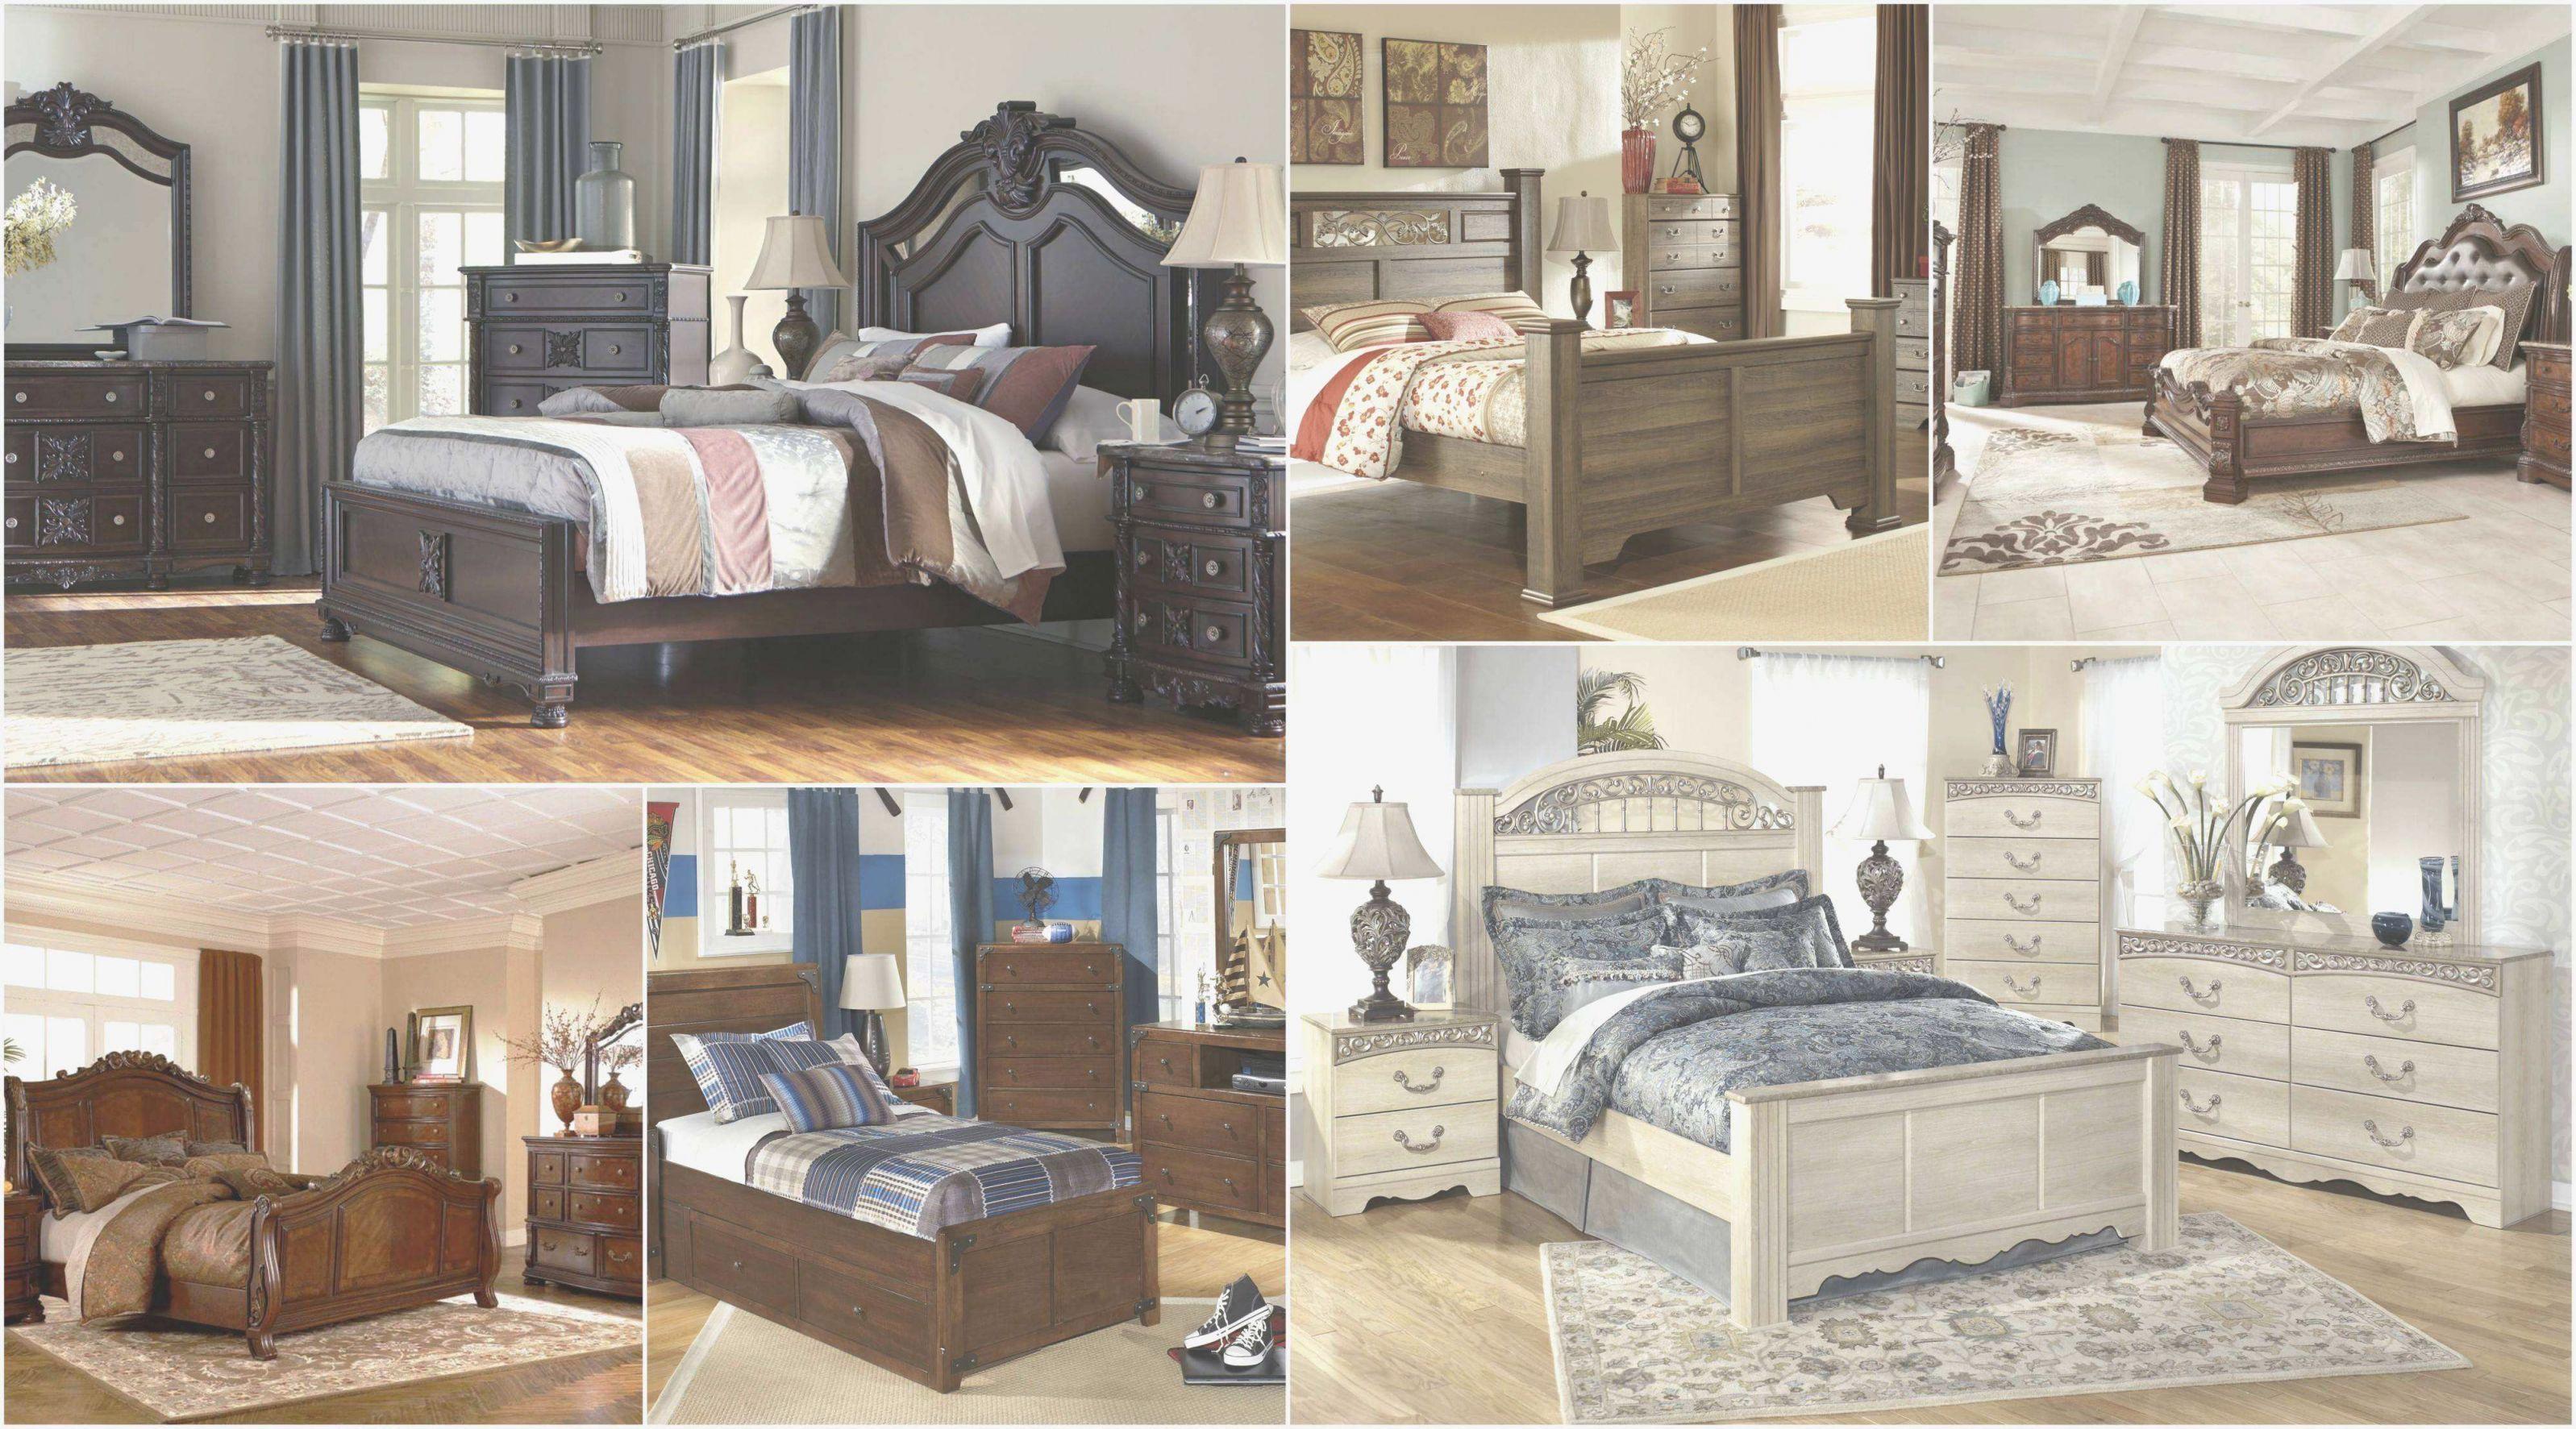 Discontinued Bedroom Sets Ashley Furniture 28 Images Bedroom Regarding Luxury Discontinued Ashley Furniture Bedroom Sets Awesome Decors